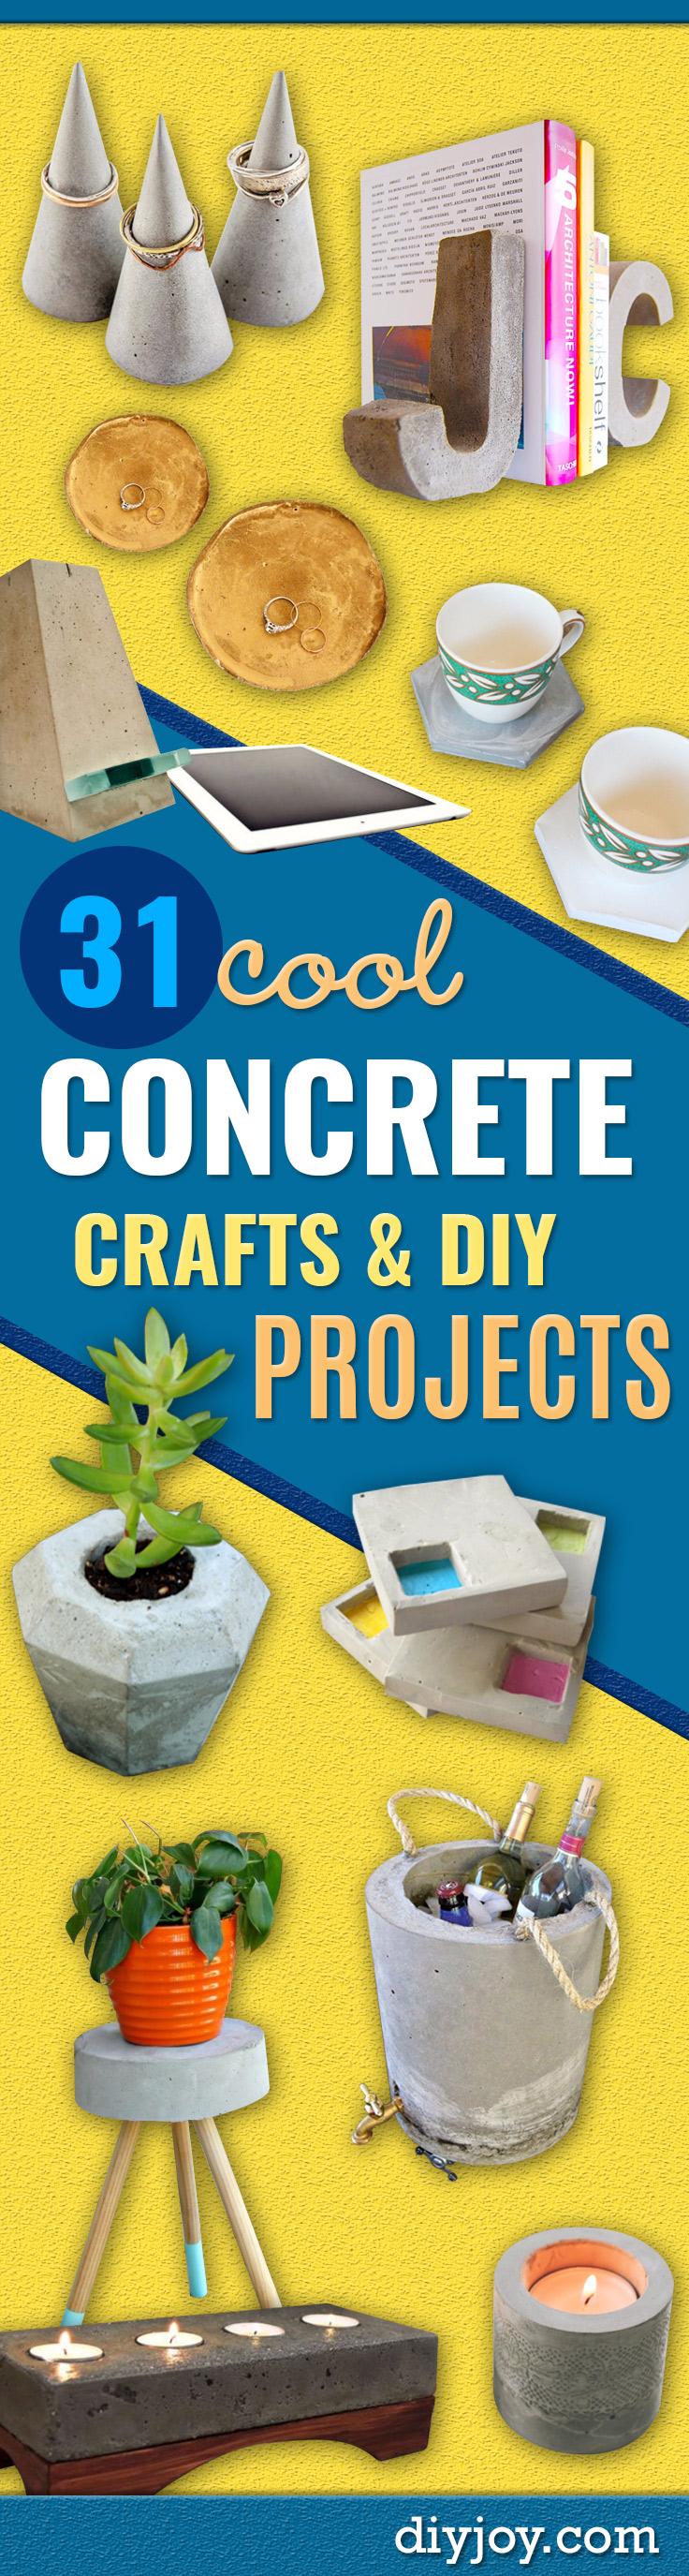 diy concrete crafts - DIY ideas with concrete - homemade christmas gifts - cheap DIY home decor ideas made with concrete